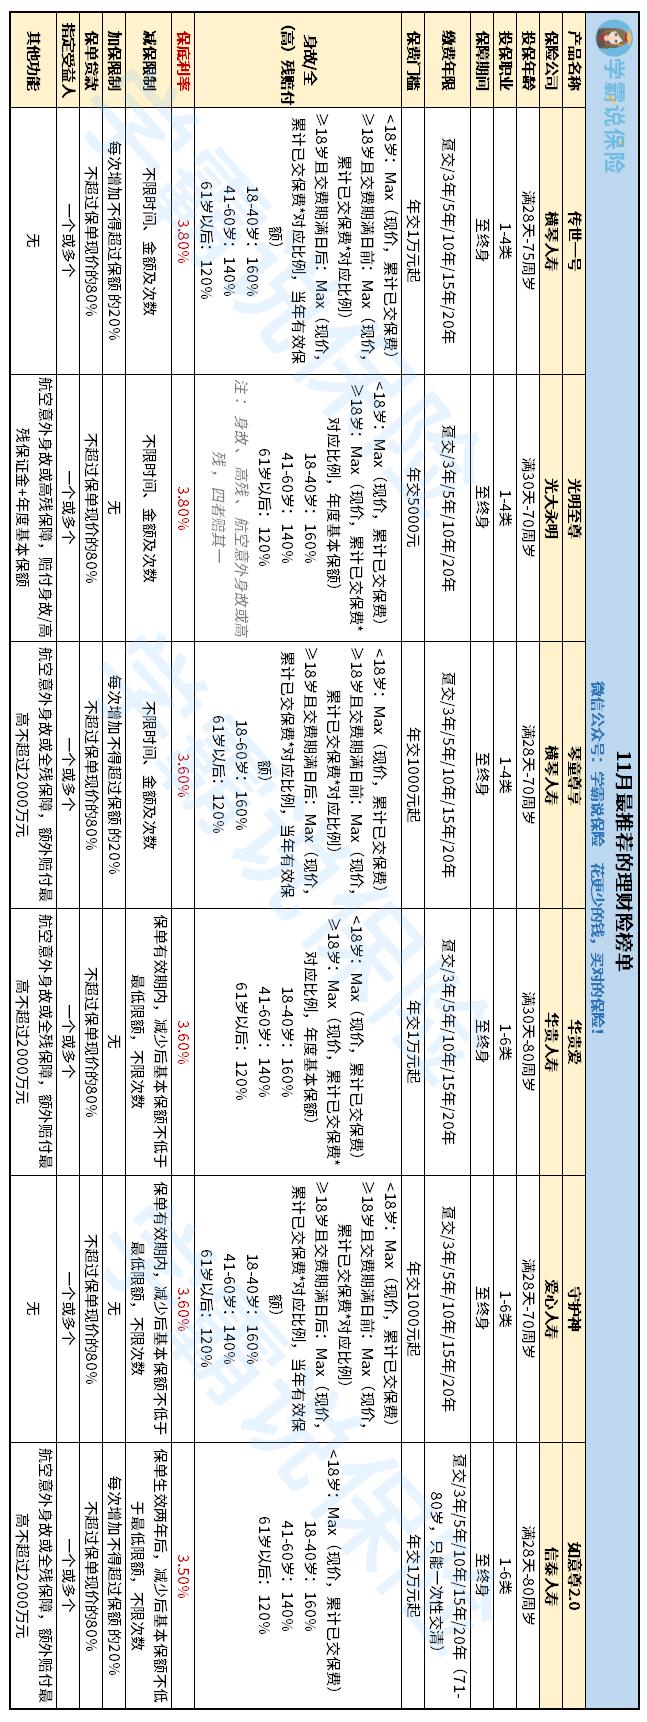 理财险榜单.png